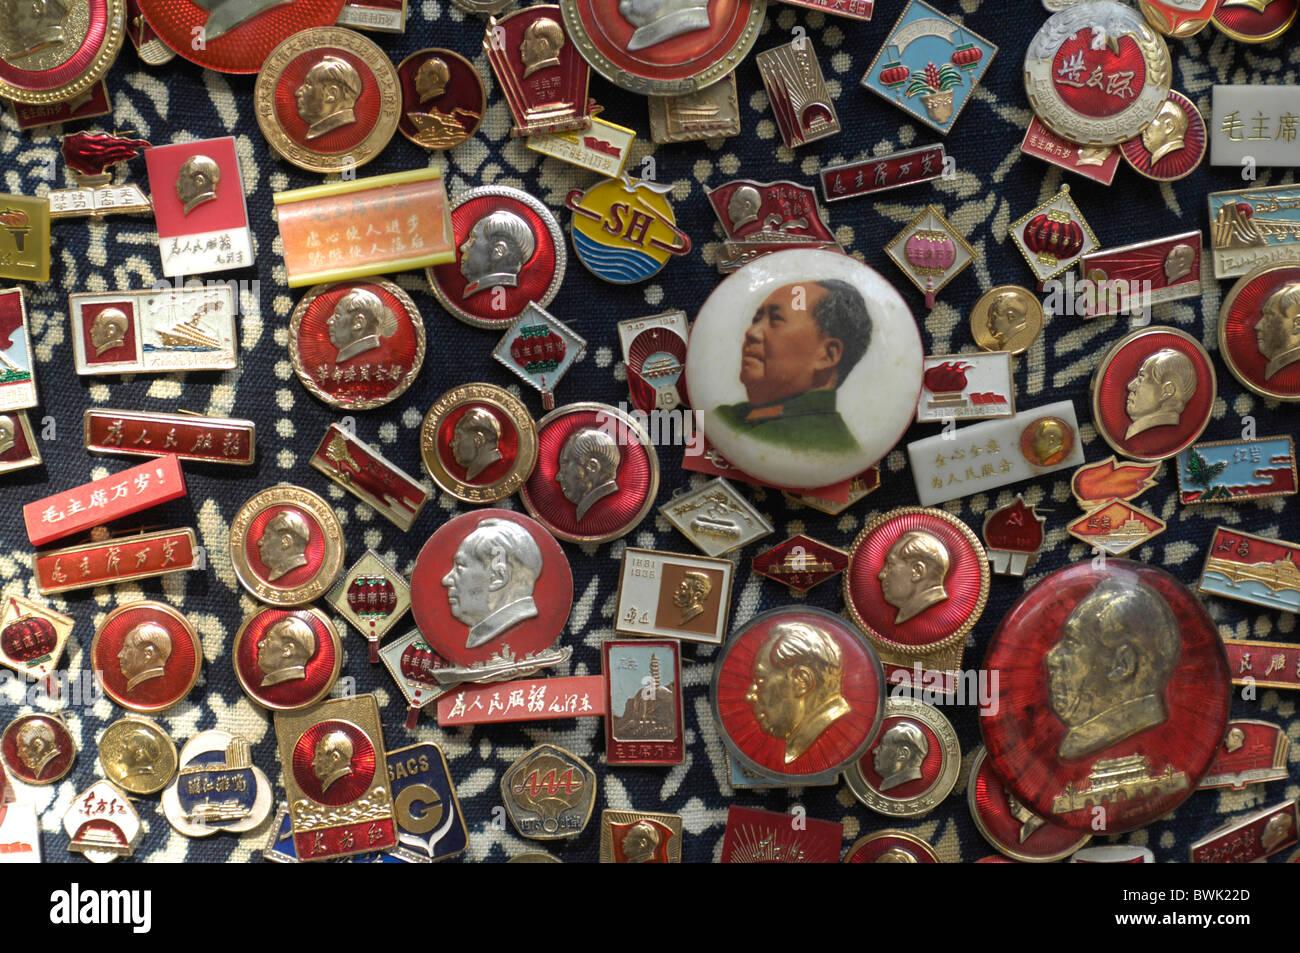 China Asia Shanghai Dongtai Lubei antique market market Mao souvenirs Pins Anstecker - Stock Image